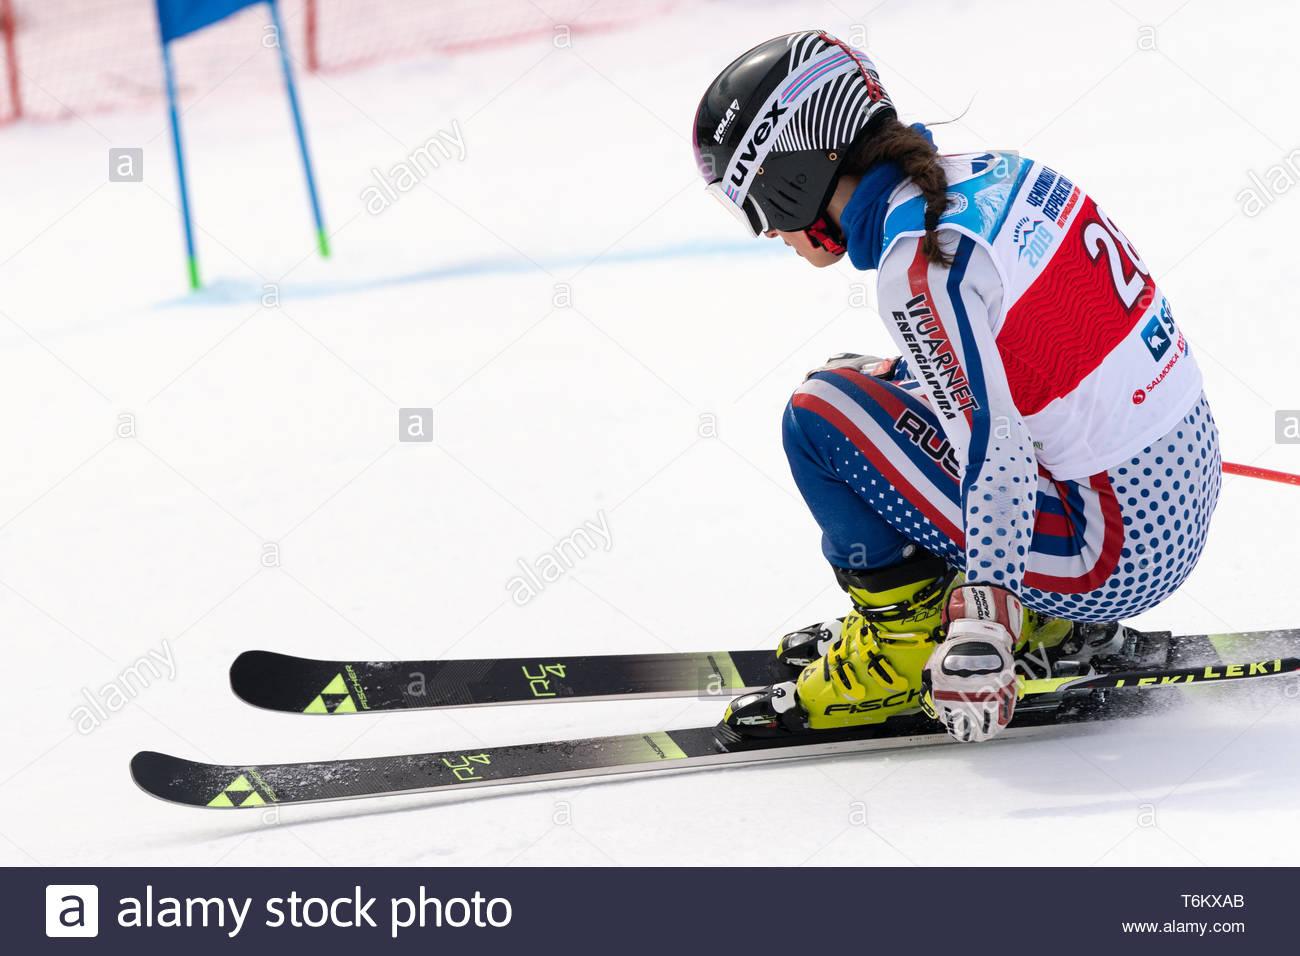 KAMCHATKA PENINSULA, RUSSIA - APRIL 2, 2019: Russian Women's Alpine Skiing Cup, International Ski Federation Championship, giant slalom. Mountain skie - Stock Image